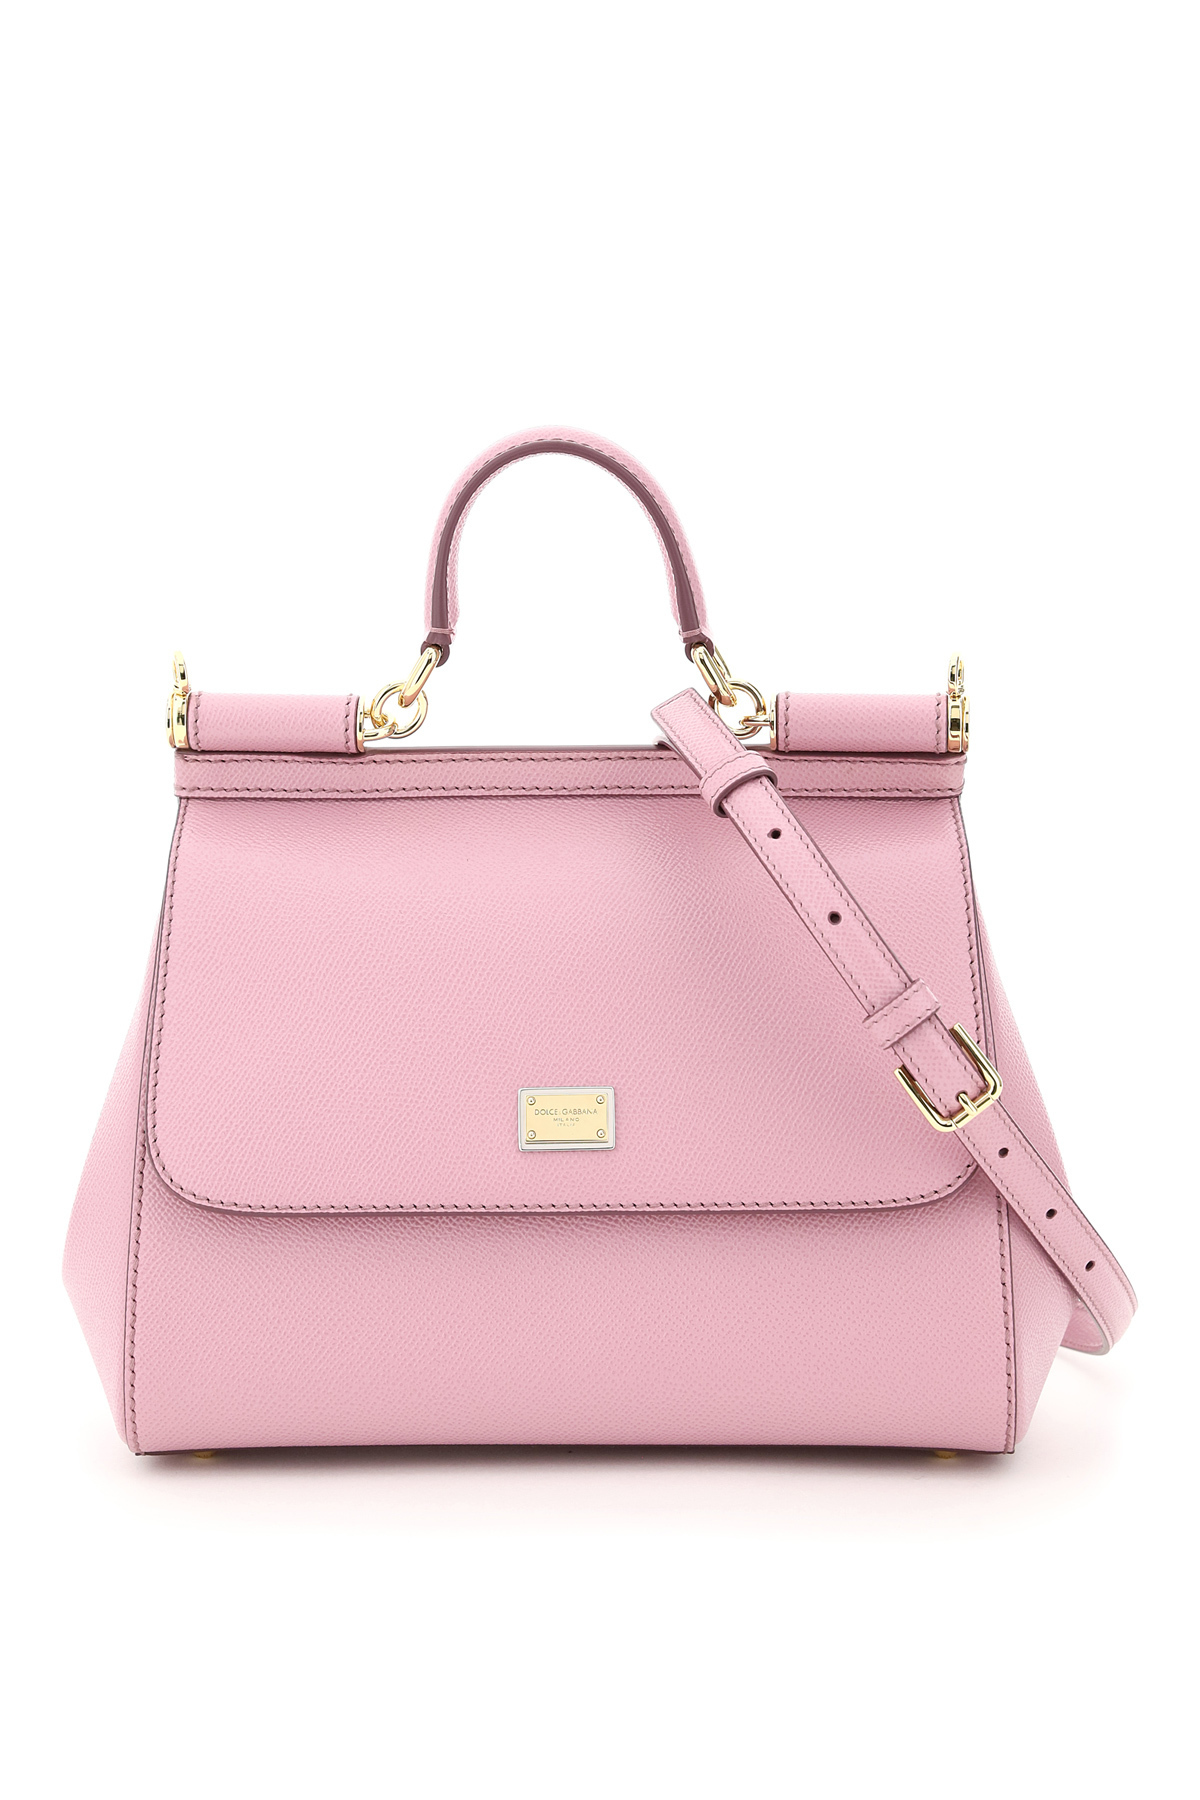 Dolce & Gabbana Medium Sicily Bag Os Pink Leather